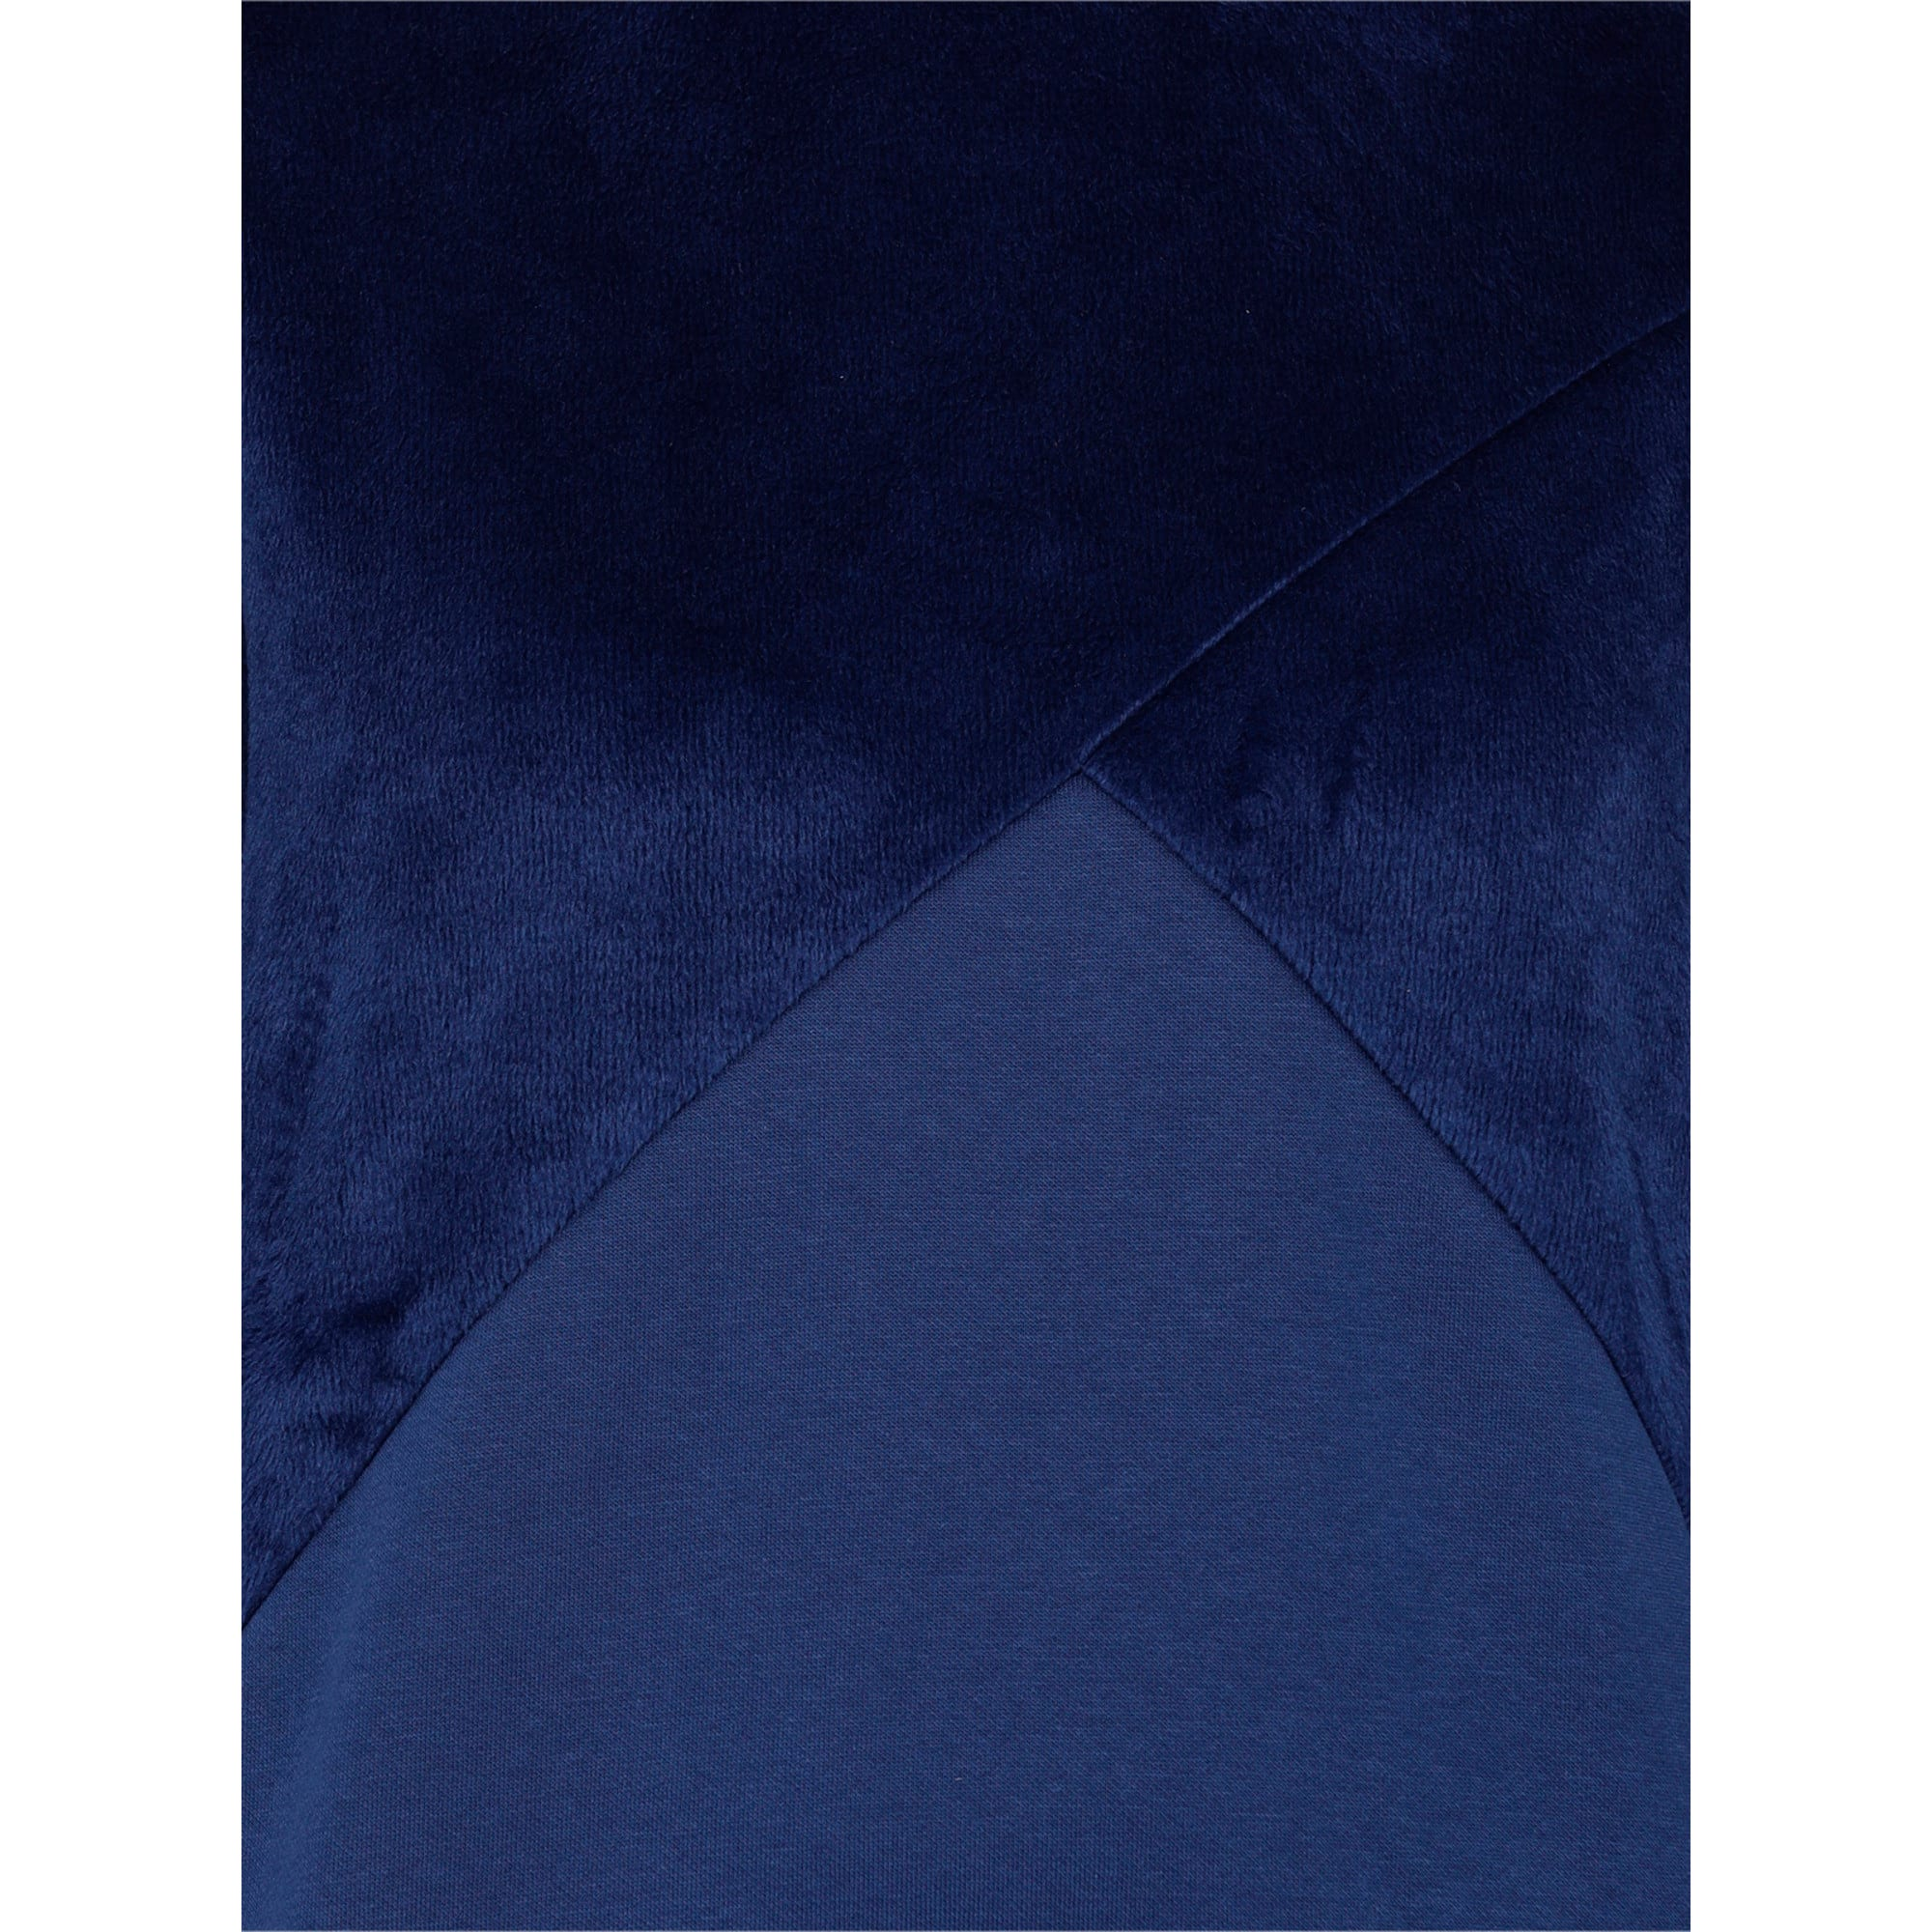 Thumbnail 4 of Archive Women's Fabric Block Sweater, Blue Depths, medium-IND